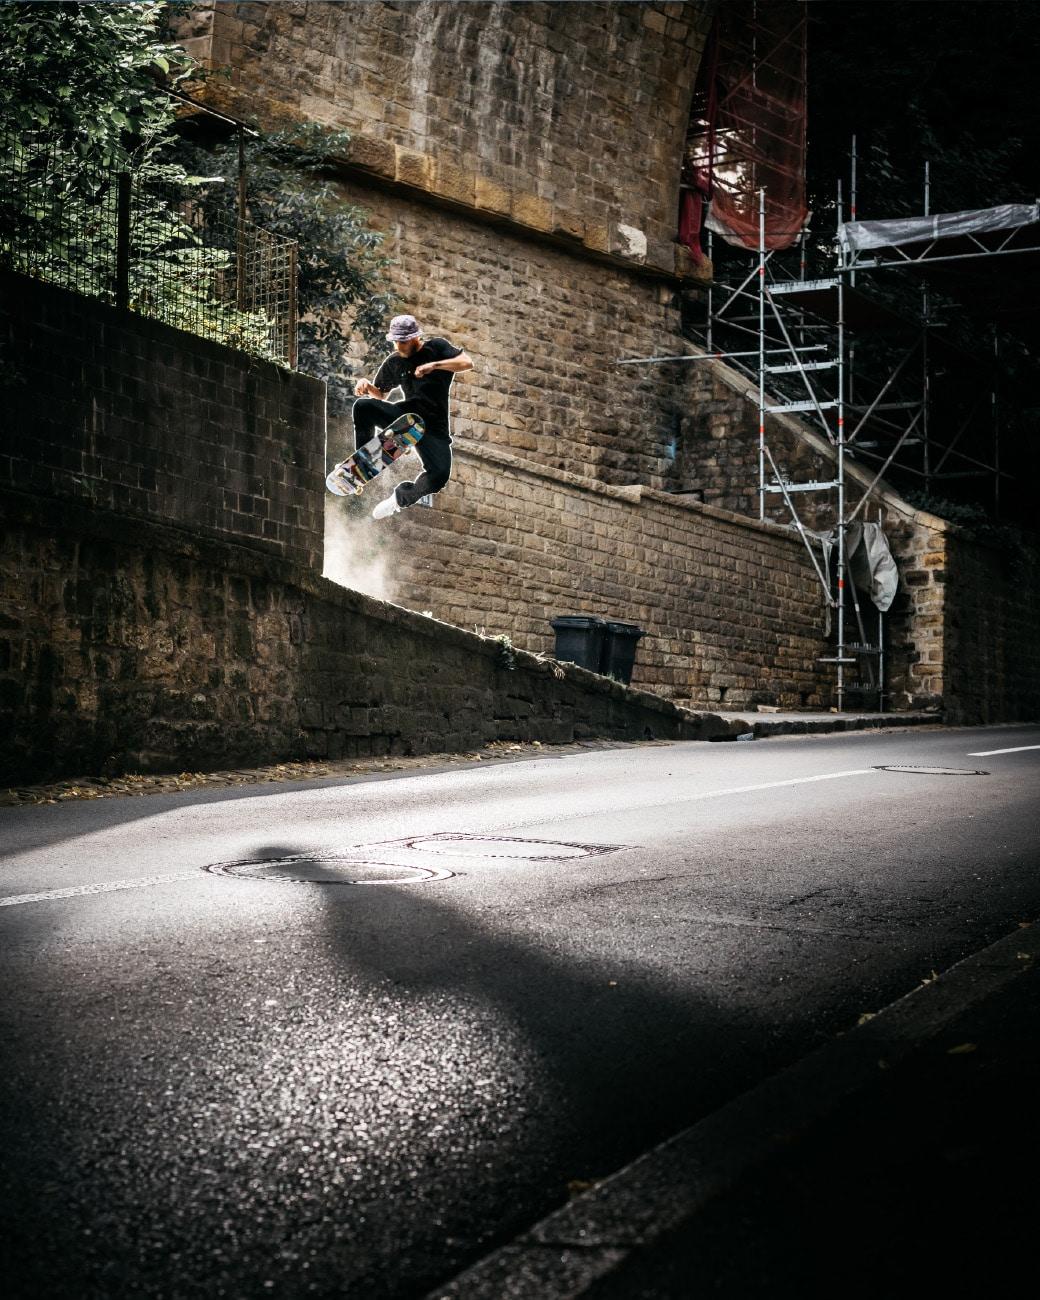 Luxemburg-irregularskatemag-tour-marv-36